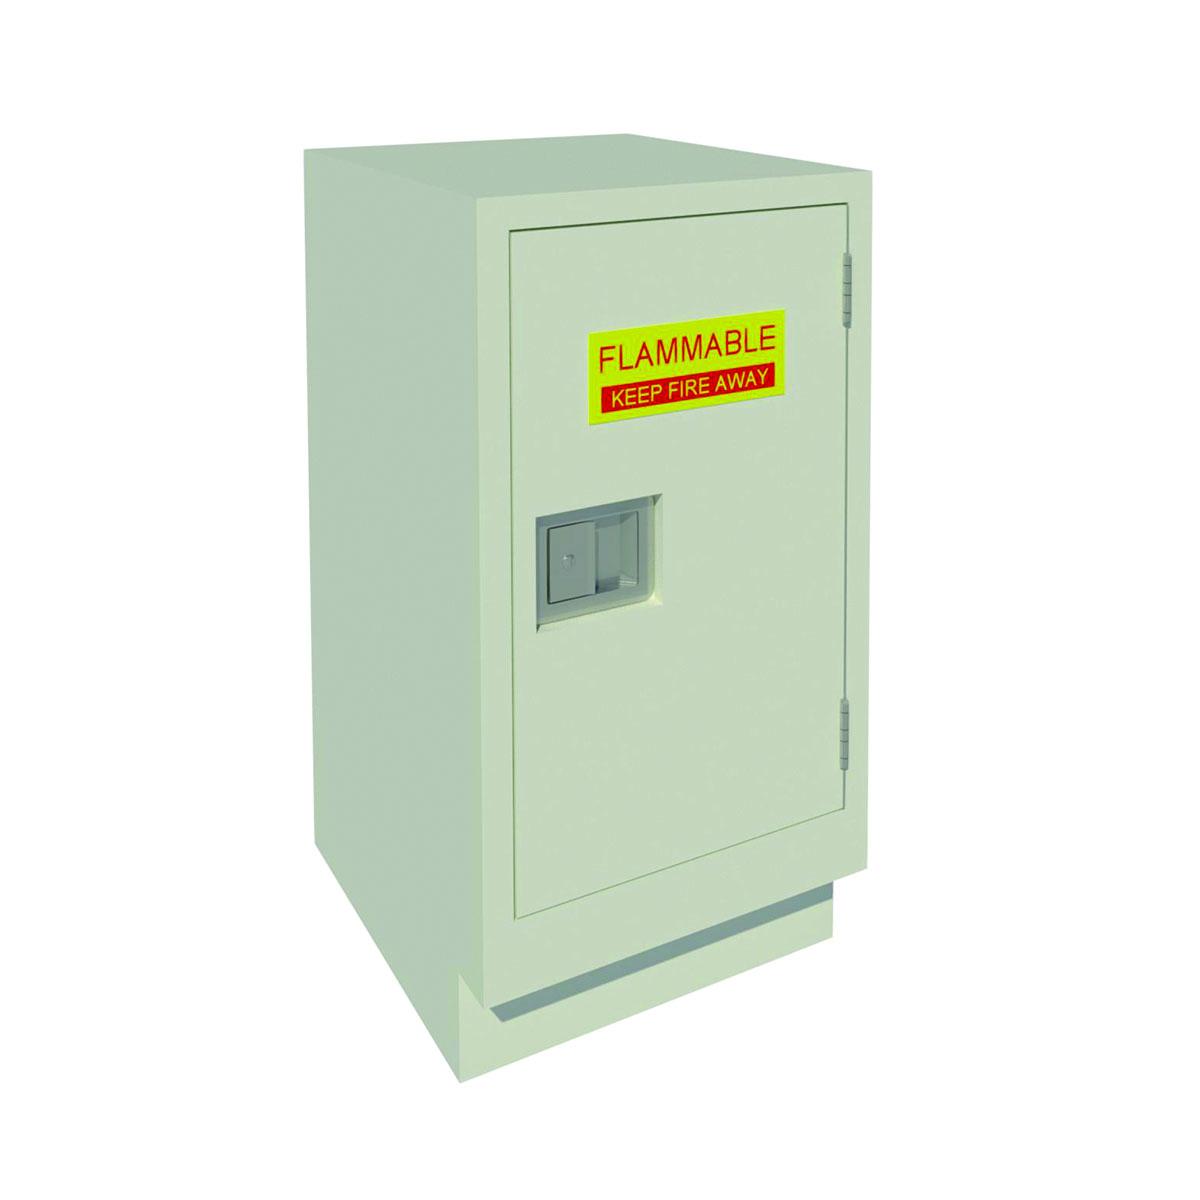 GSJTP189-24SLAS | Stand. Solvent Cab RH 1 Door 24 W